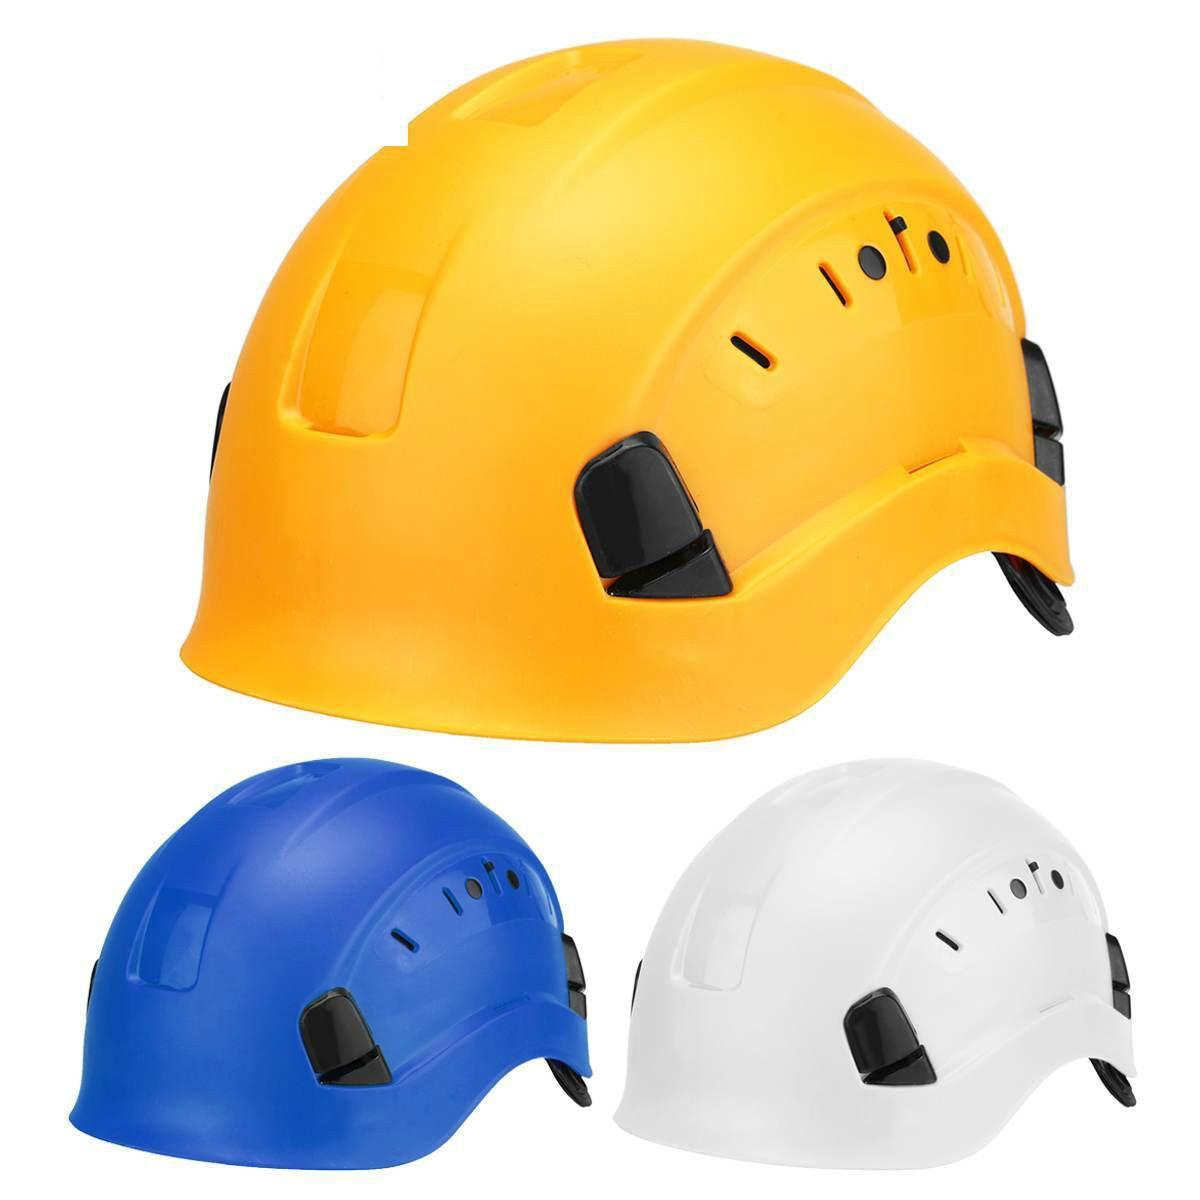 ABS Safety Helmet Construction Climbing Steeplejack Worker Protective Helmet Hard Hat Cap Outdoor Workplace Safety Supplies